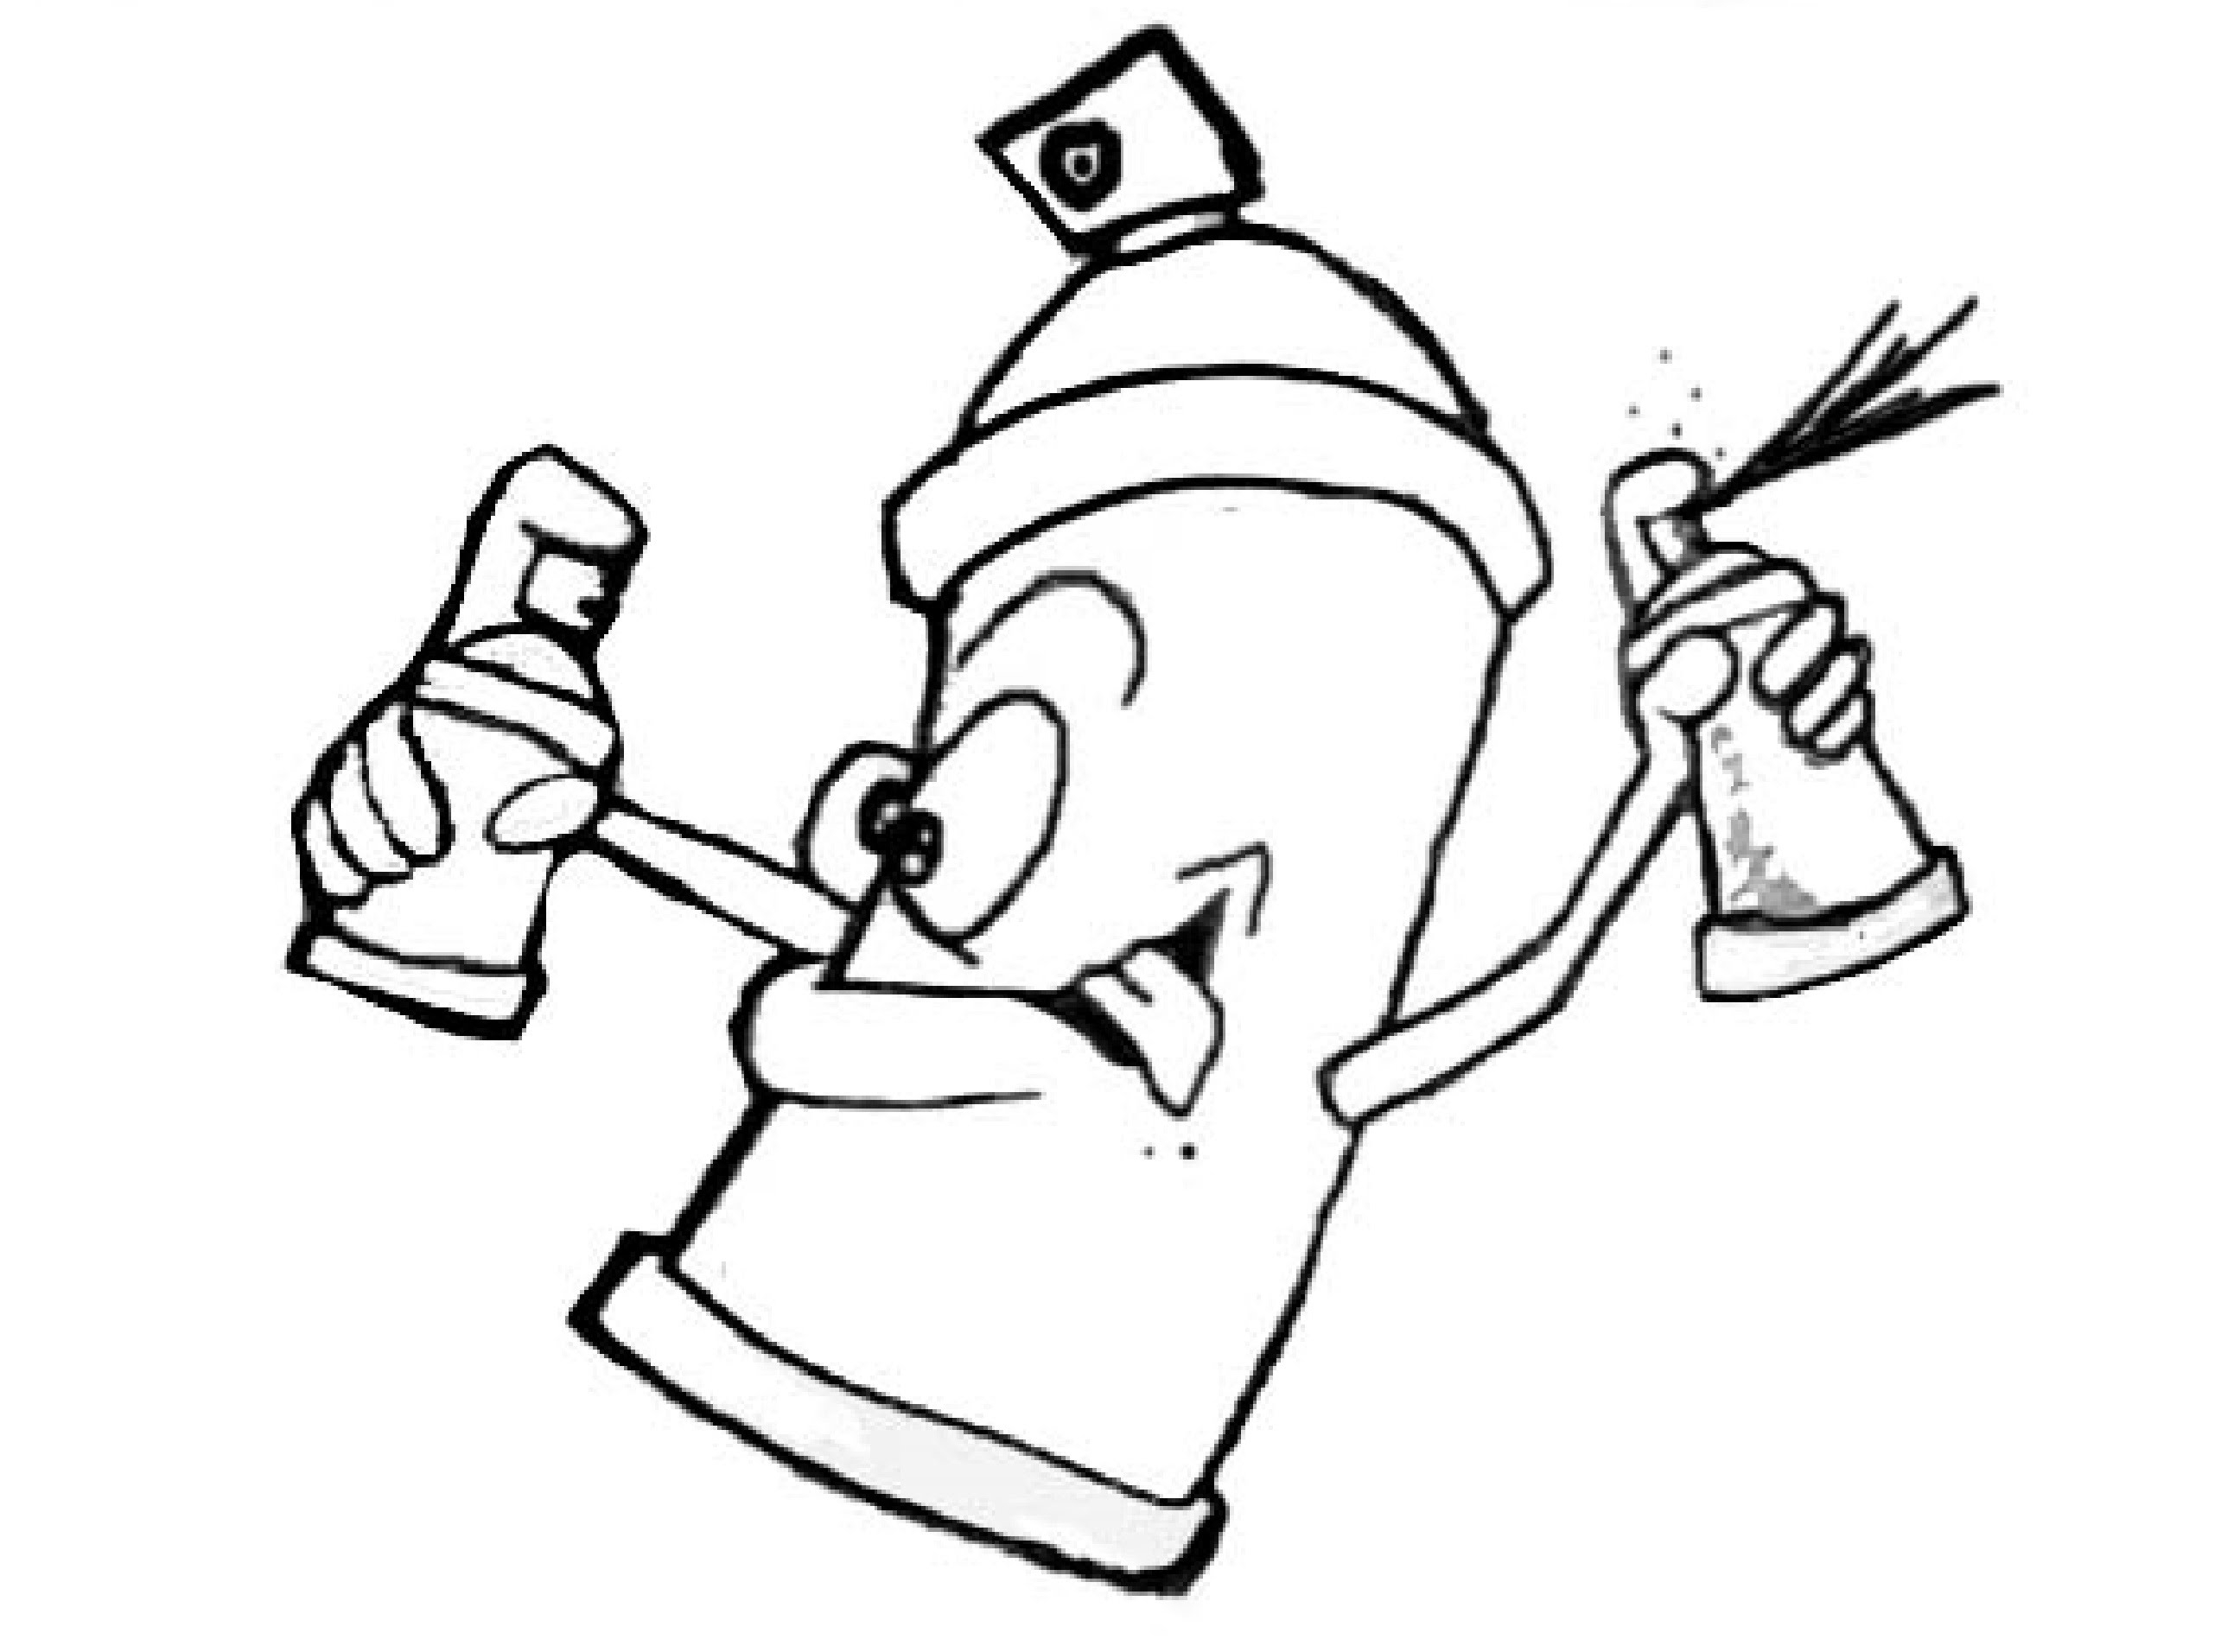 2592x1912 draw cartoon spray cans graffiti spray cans cartoon graffiti cans